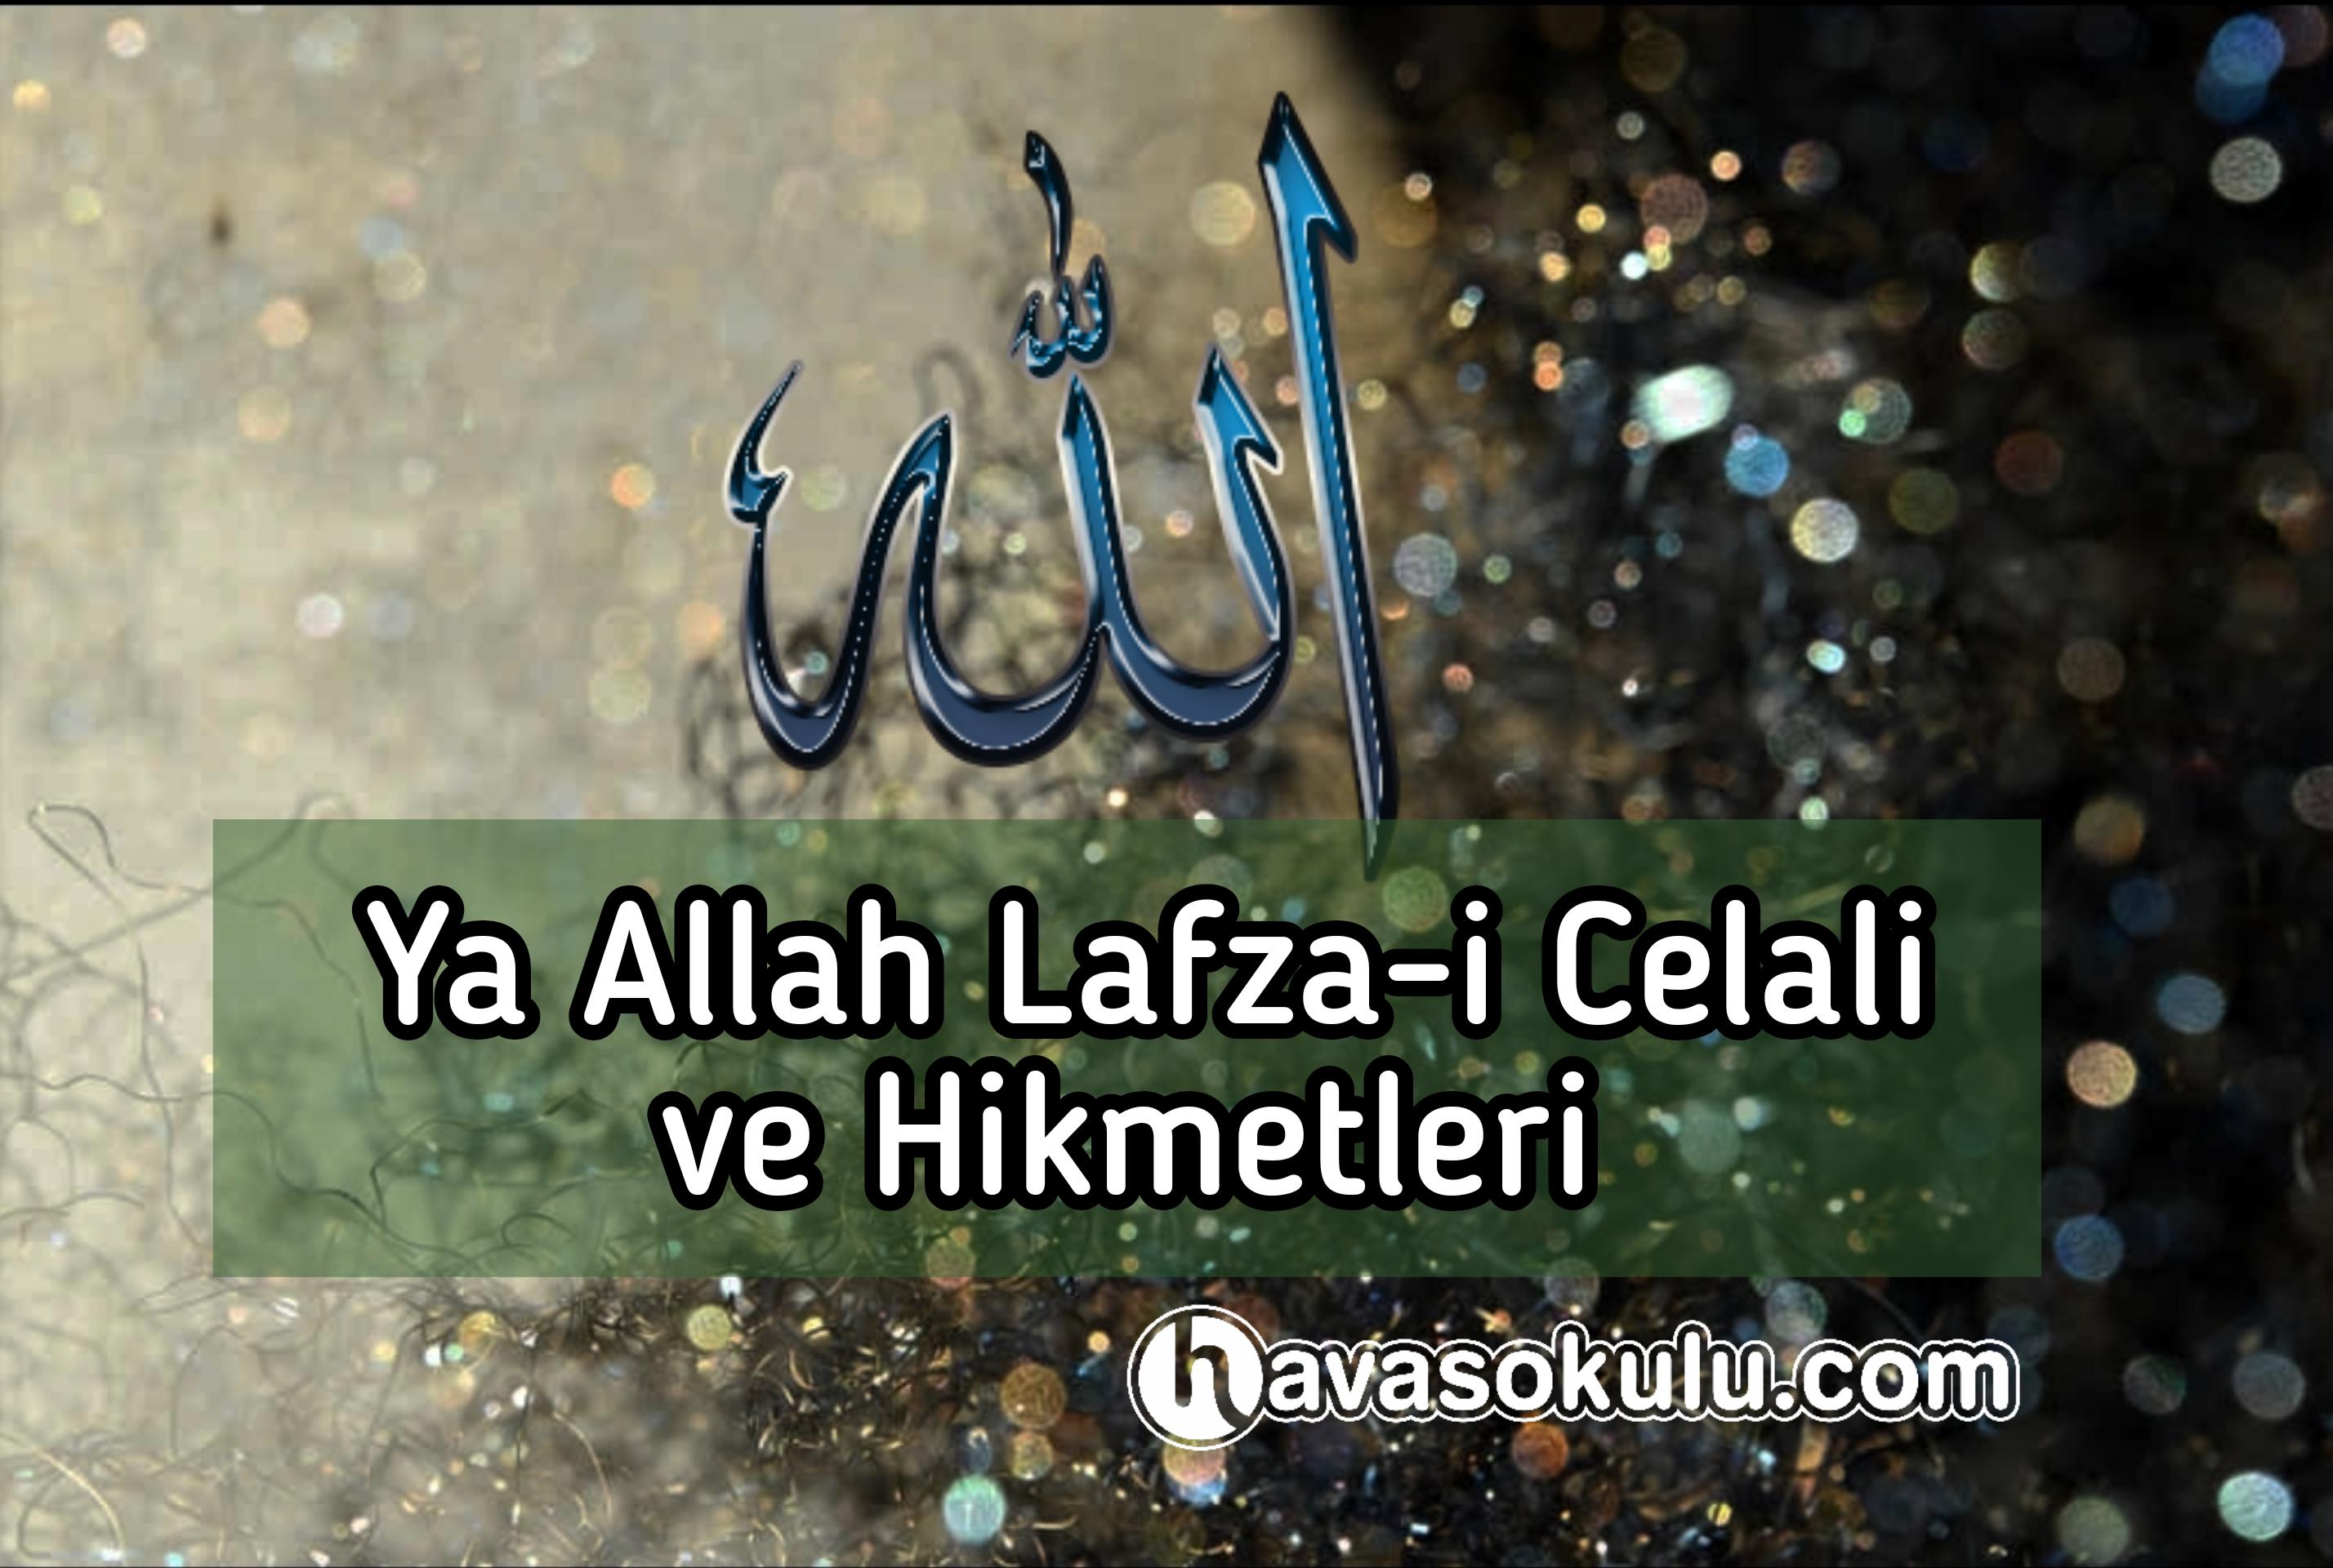 Ya Allah Lafza-i Celali ve Hikmetleri